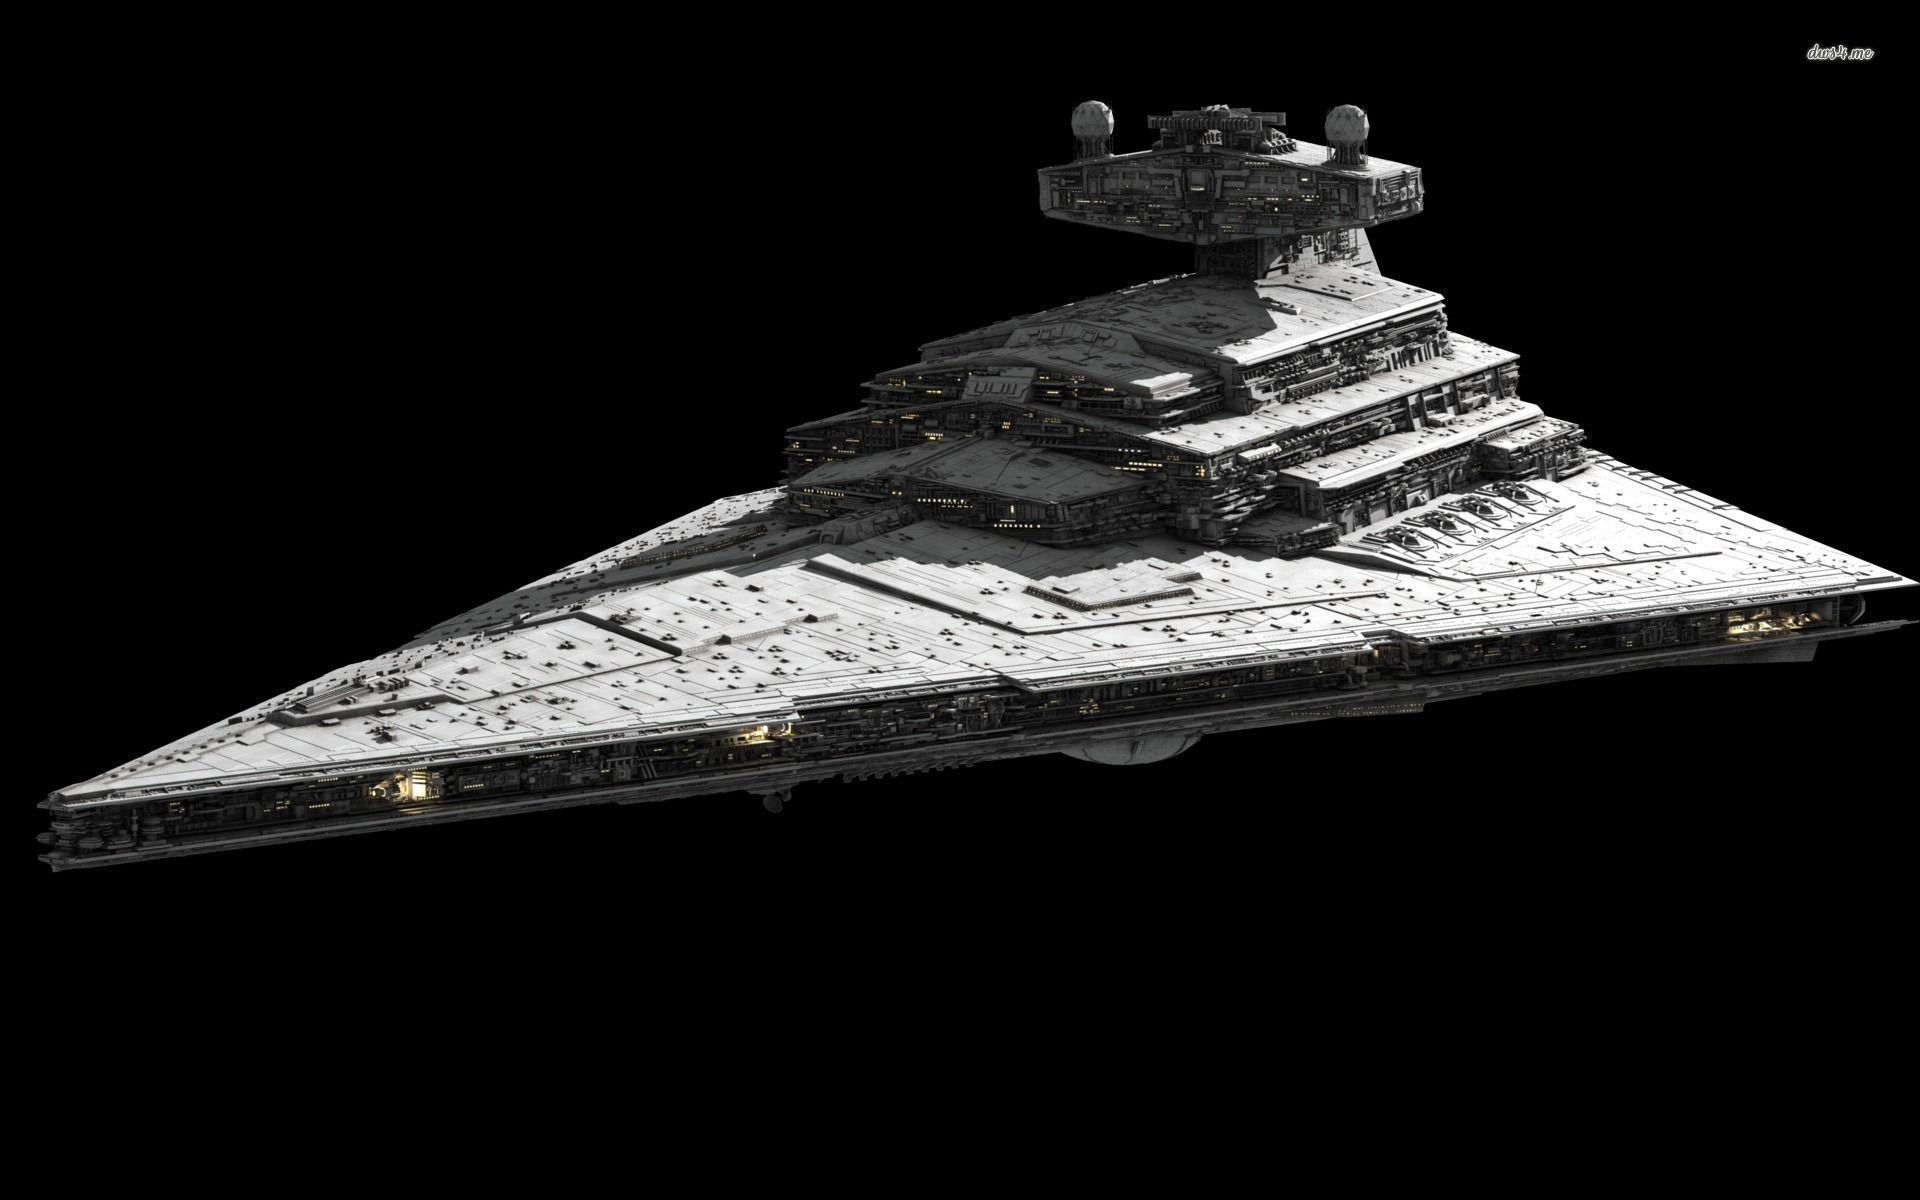 2771-spaceship-1920x1200- ...